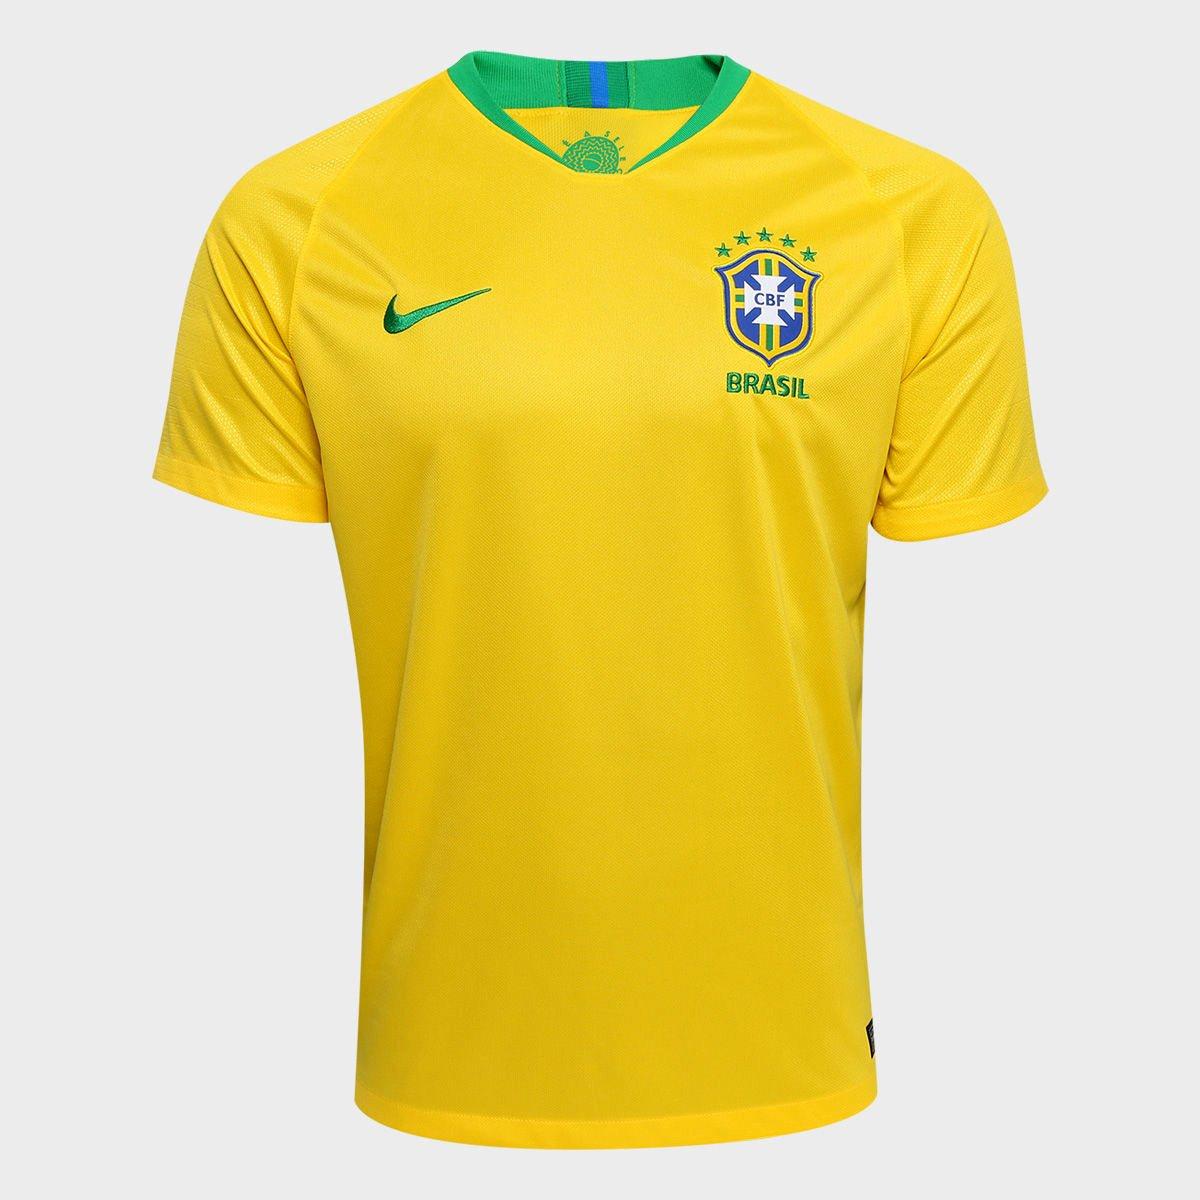 f821cb15c9 ... Camisa Seleção Brasil I 2018 nº 2 T. Silva - Torcedor Nike Masculina ...